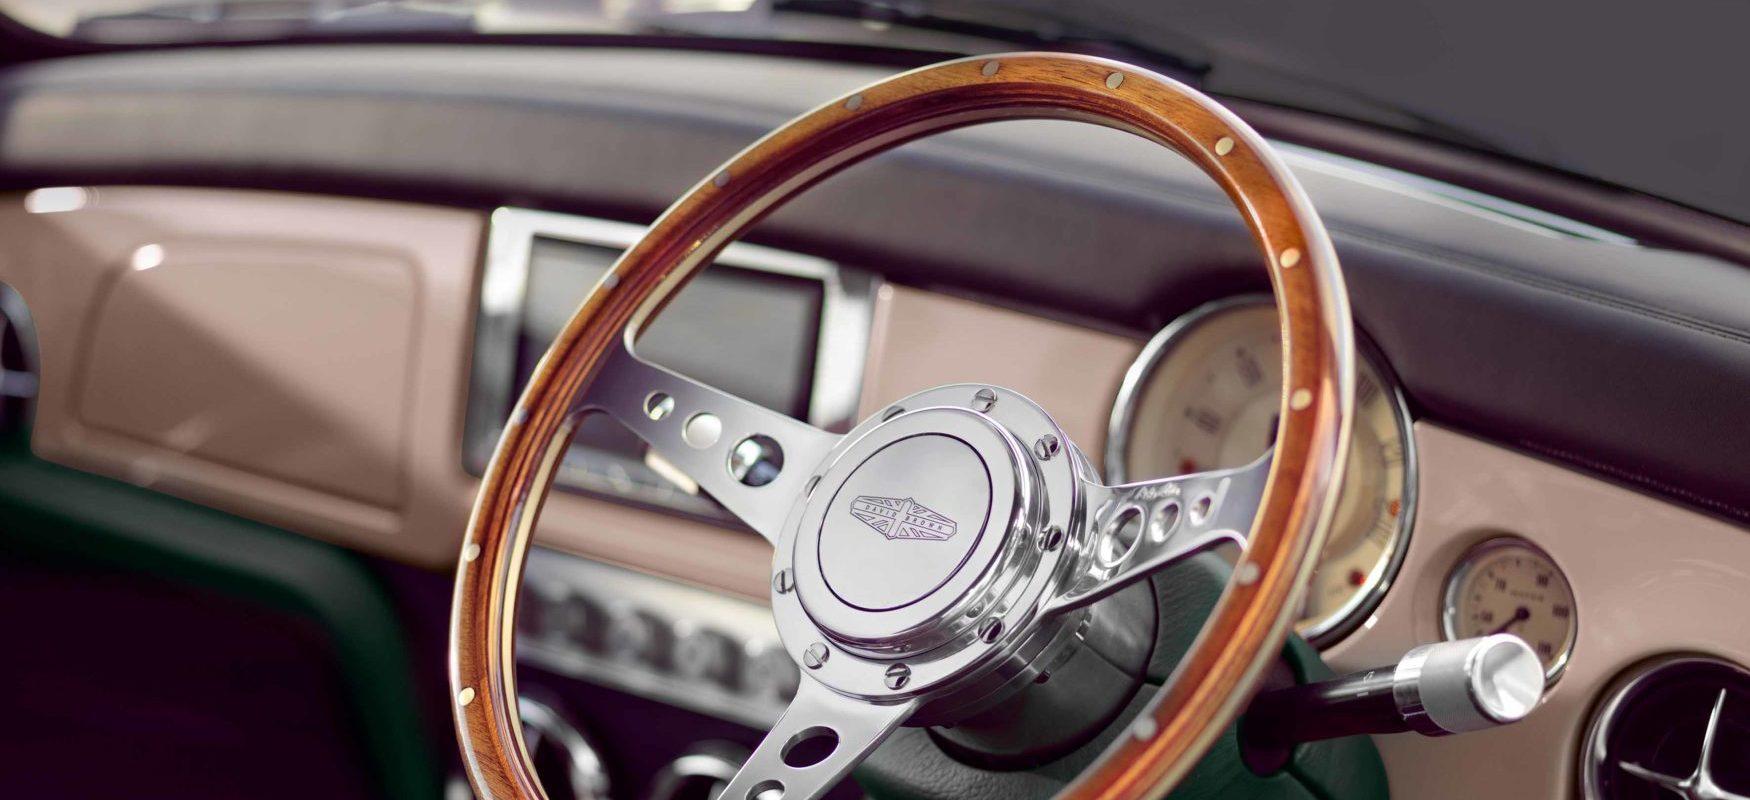 Mini Remastered by David Brown Automotive - David Brown